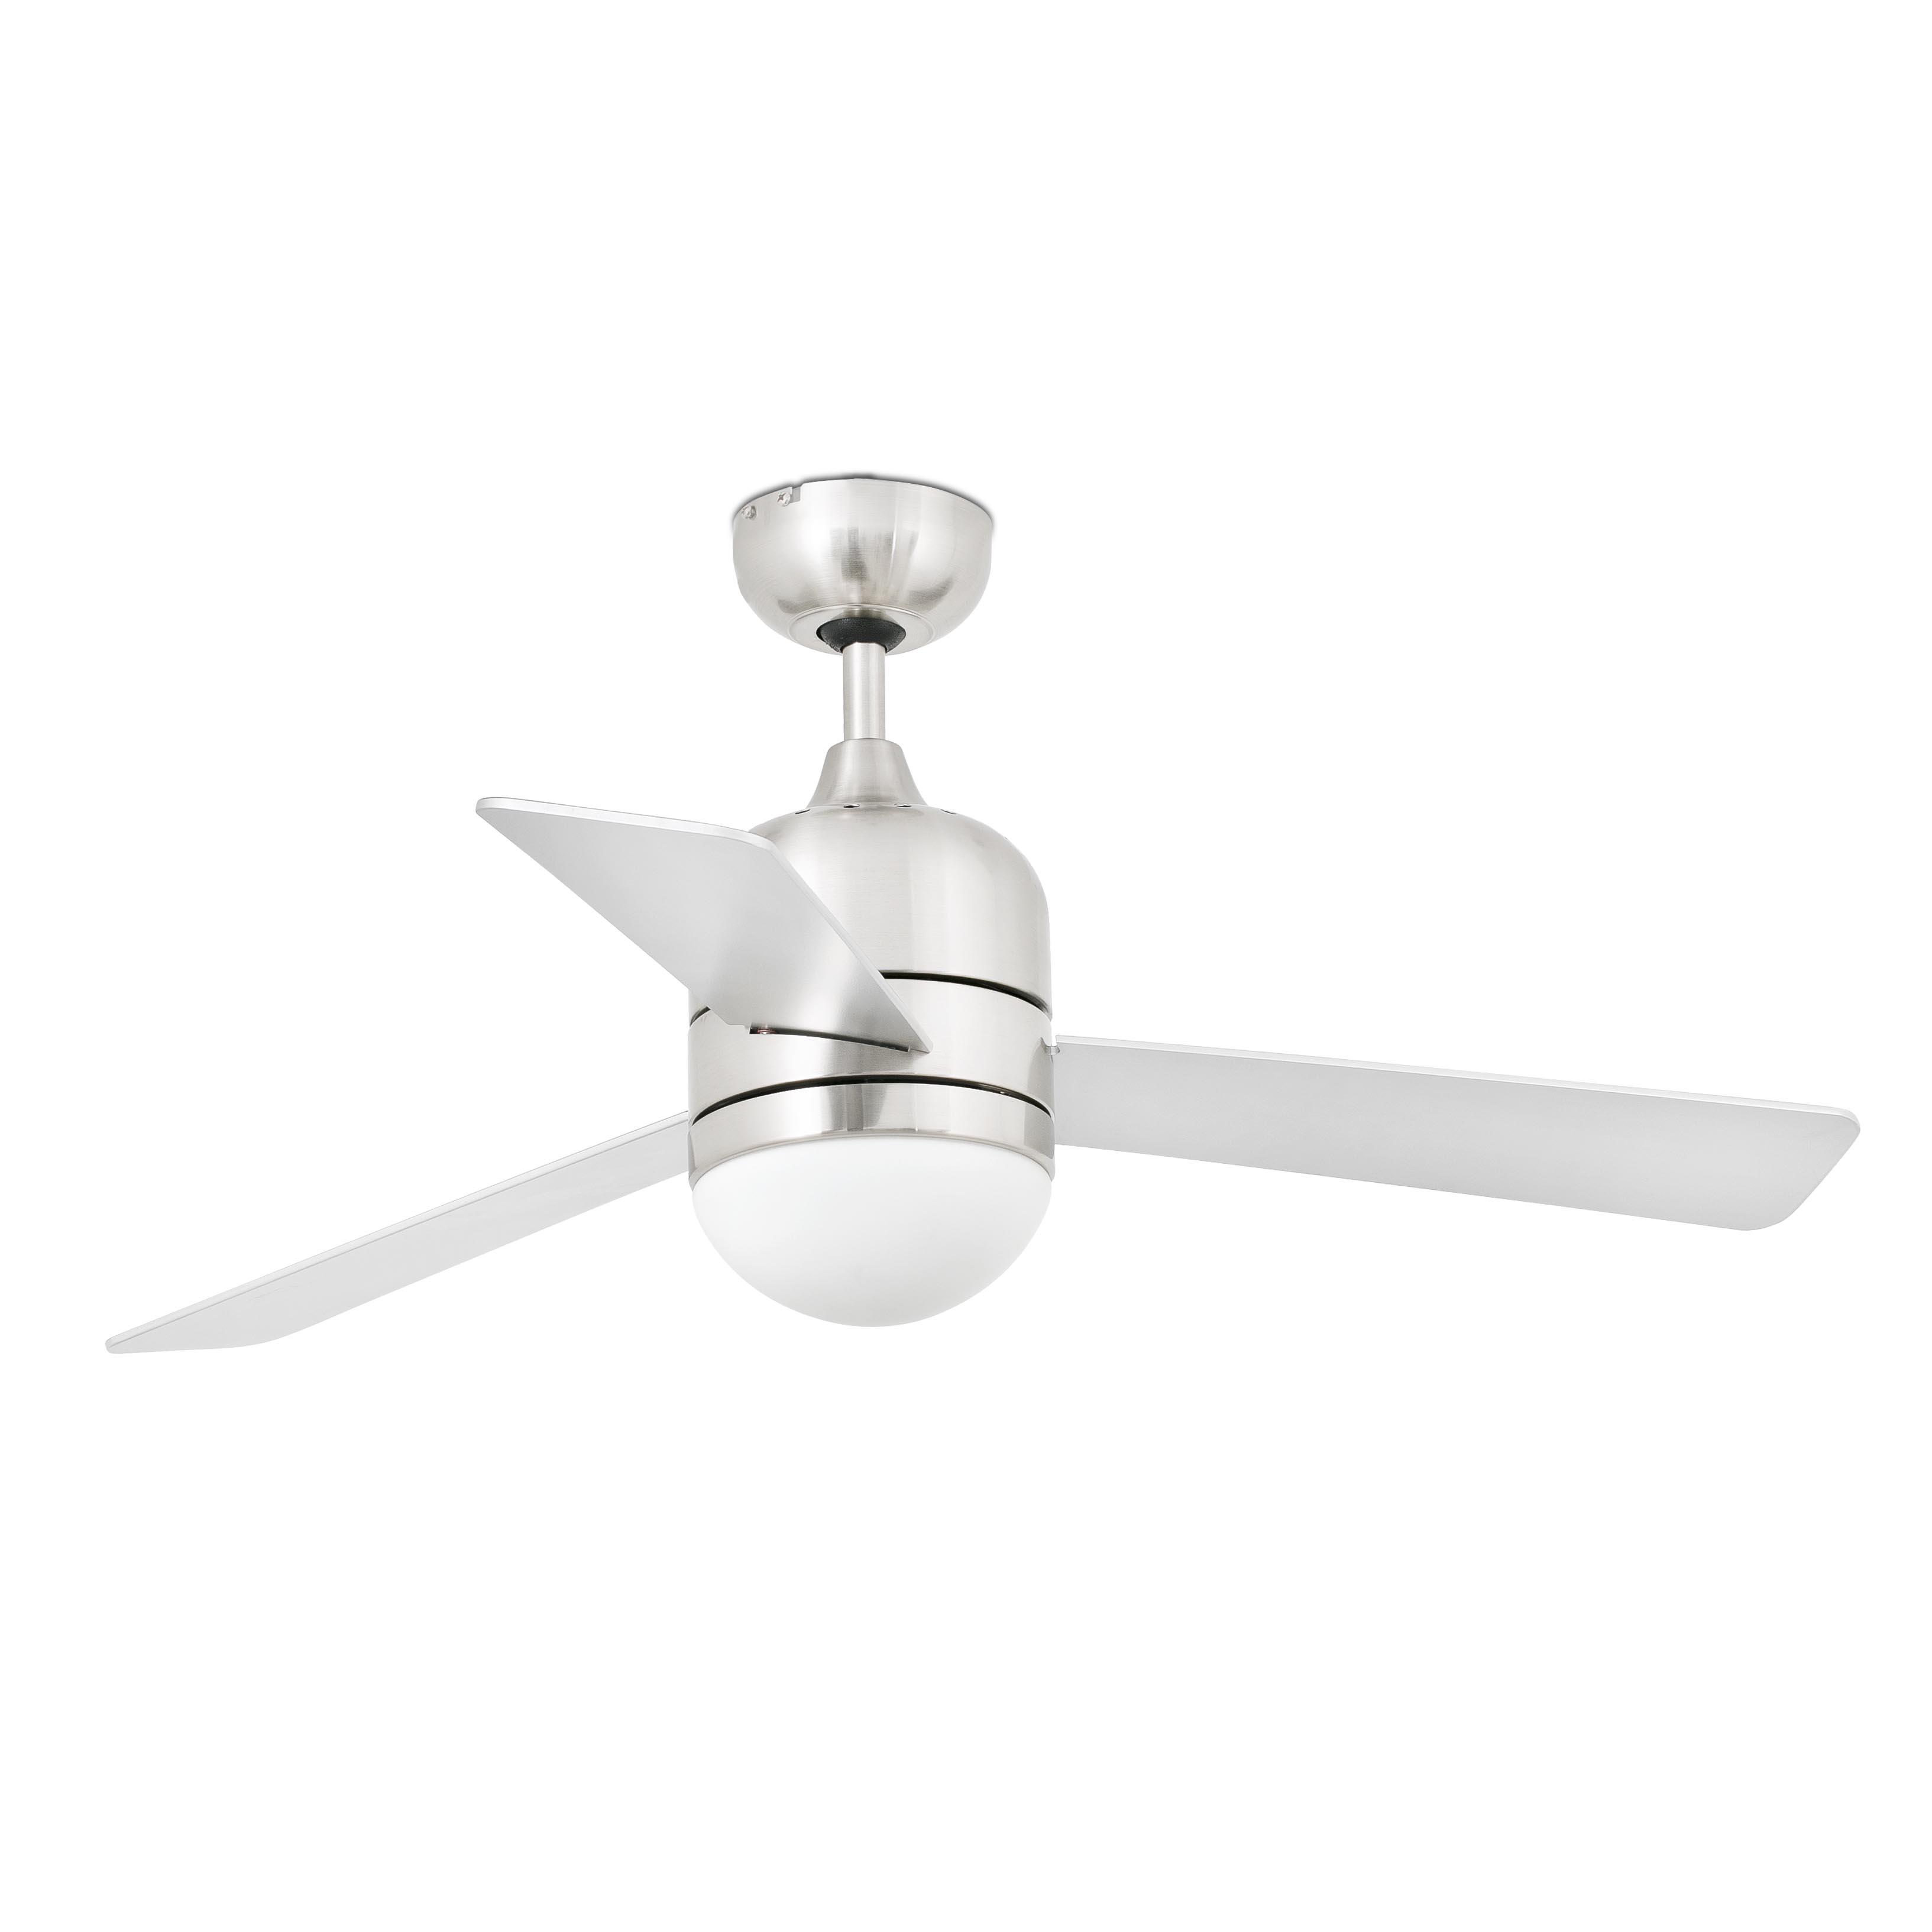 Ceiling Fan Cebu Nickel Matt 106cm 42 Quot With Light